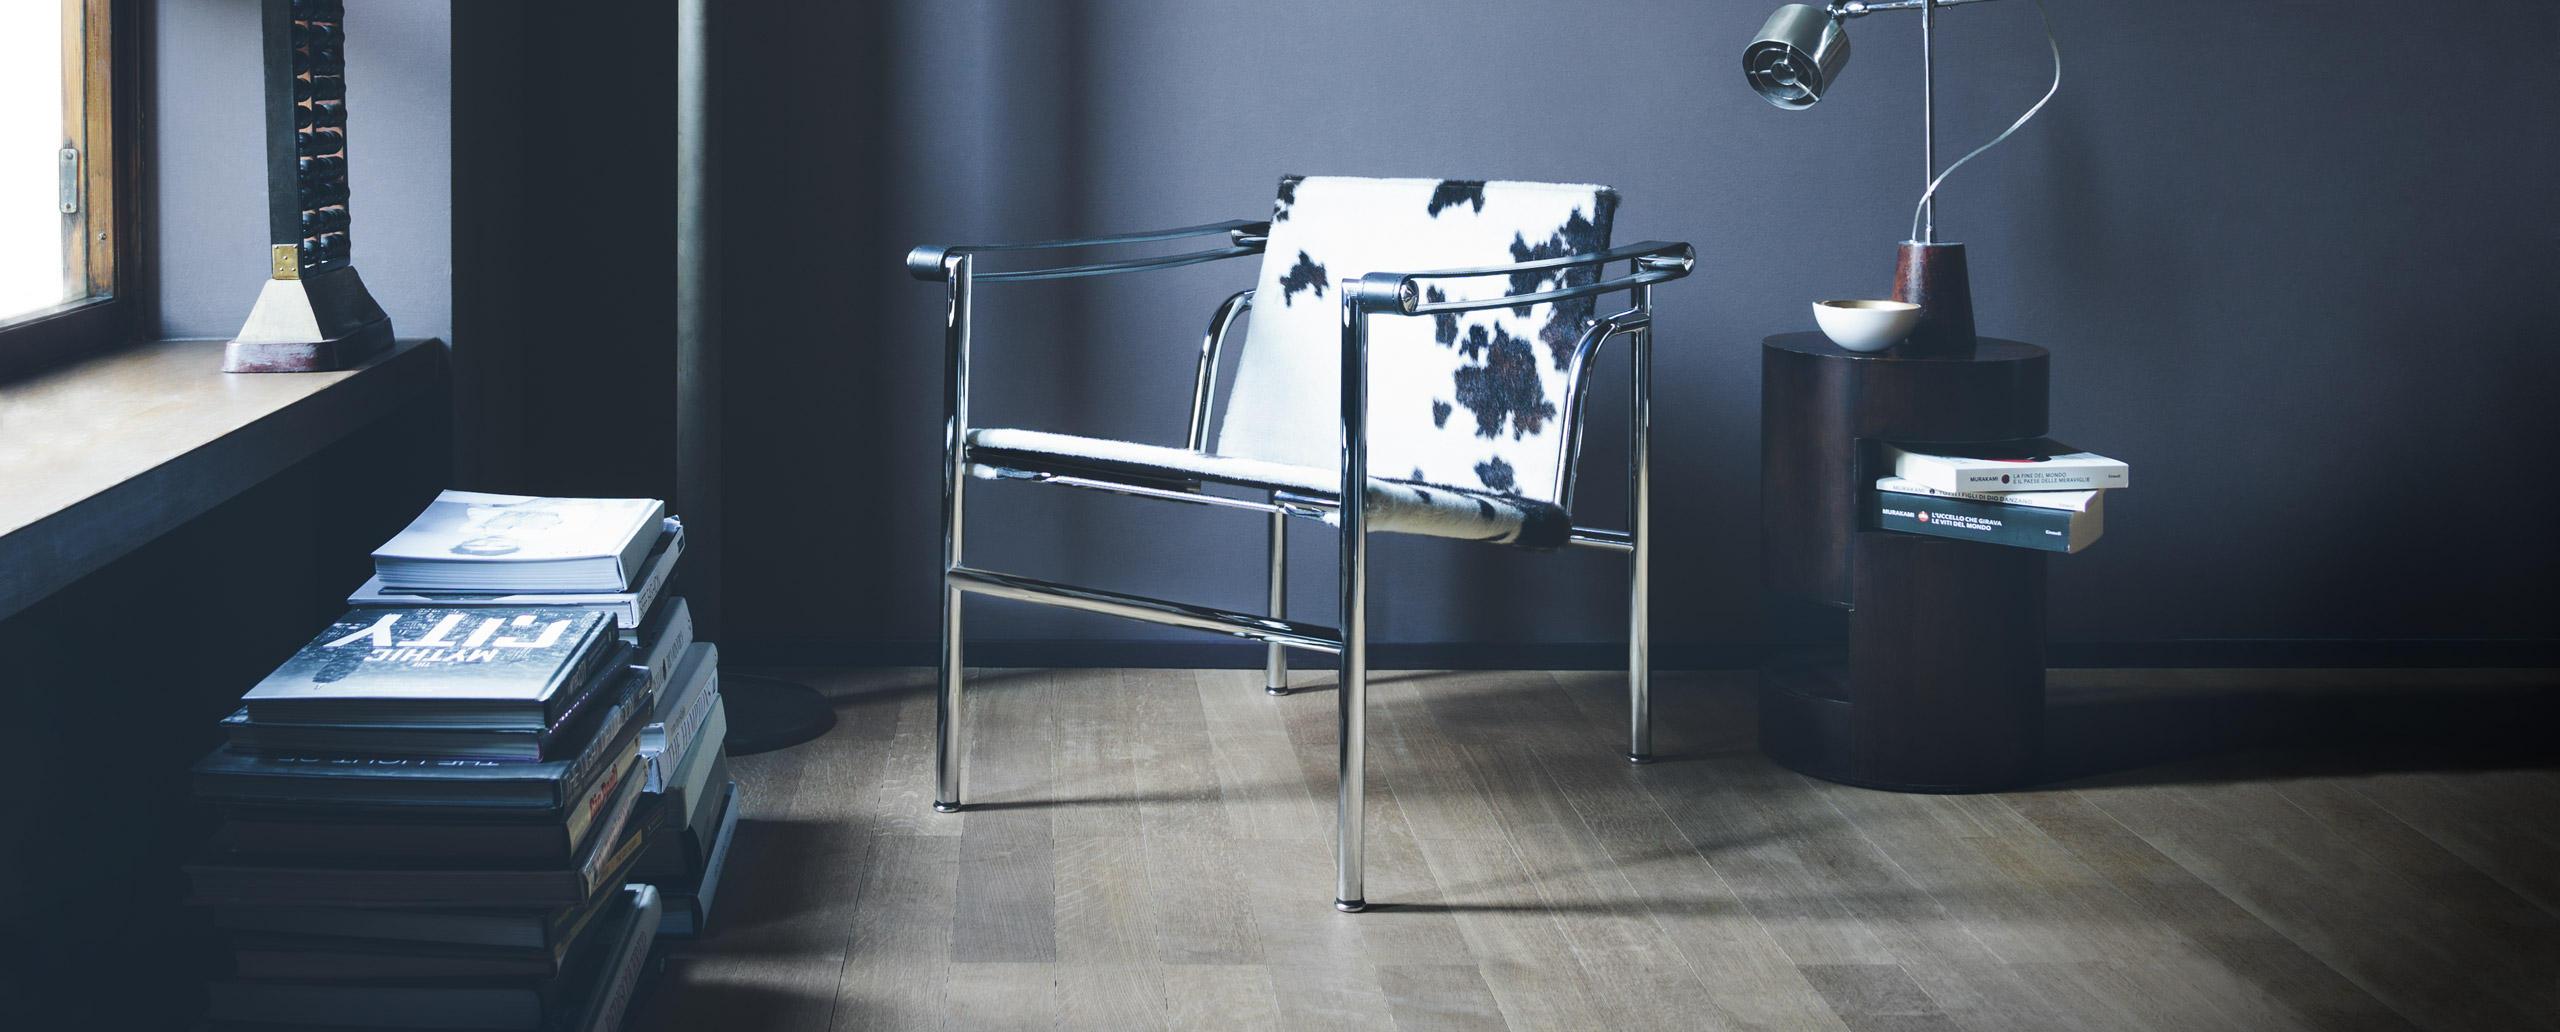 lc1 cassina le corbusier. Black Bedroom Furniture Sets. Home Design Ideas